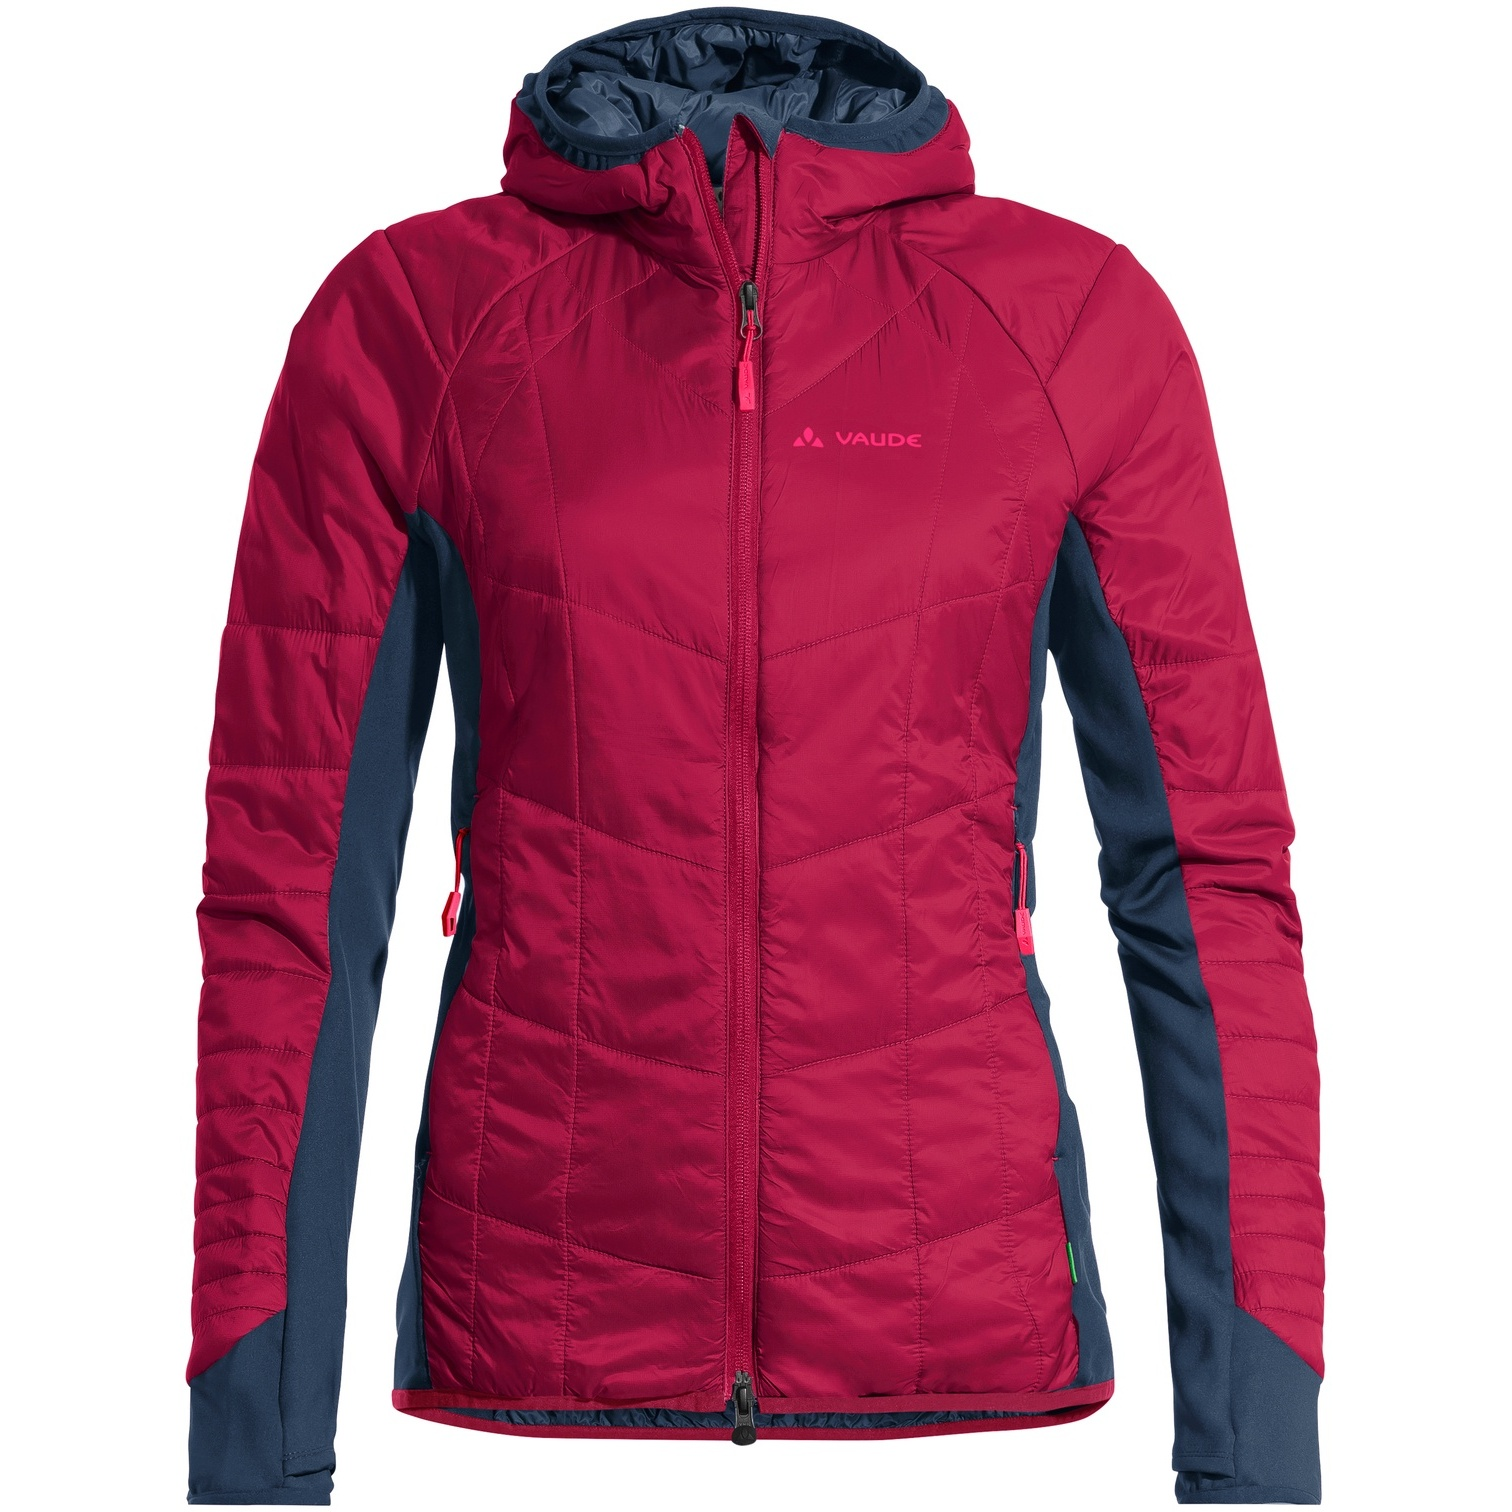 Image of Vaude Women's Sesvenna Jacket III - crimson red